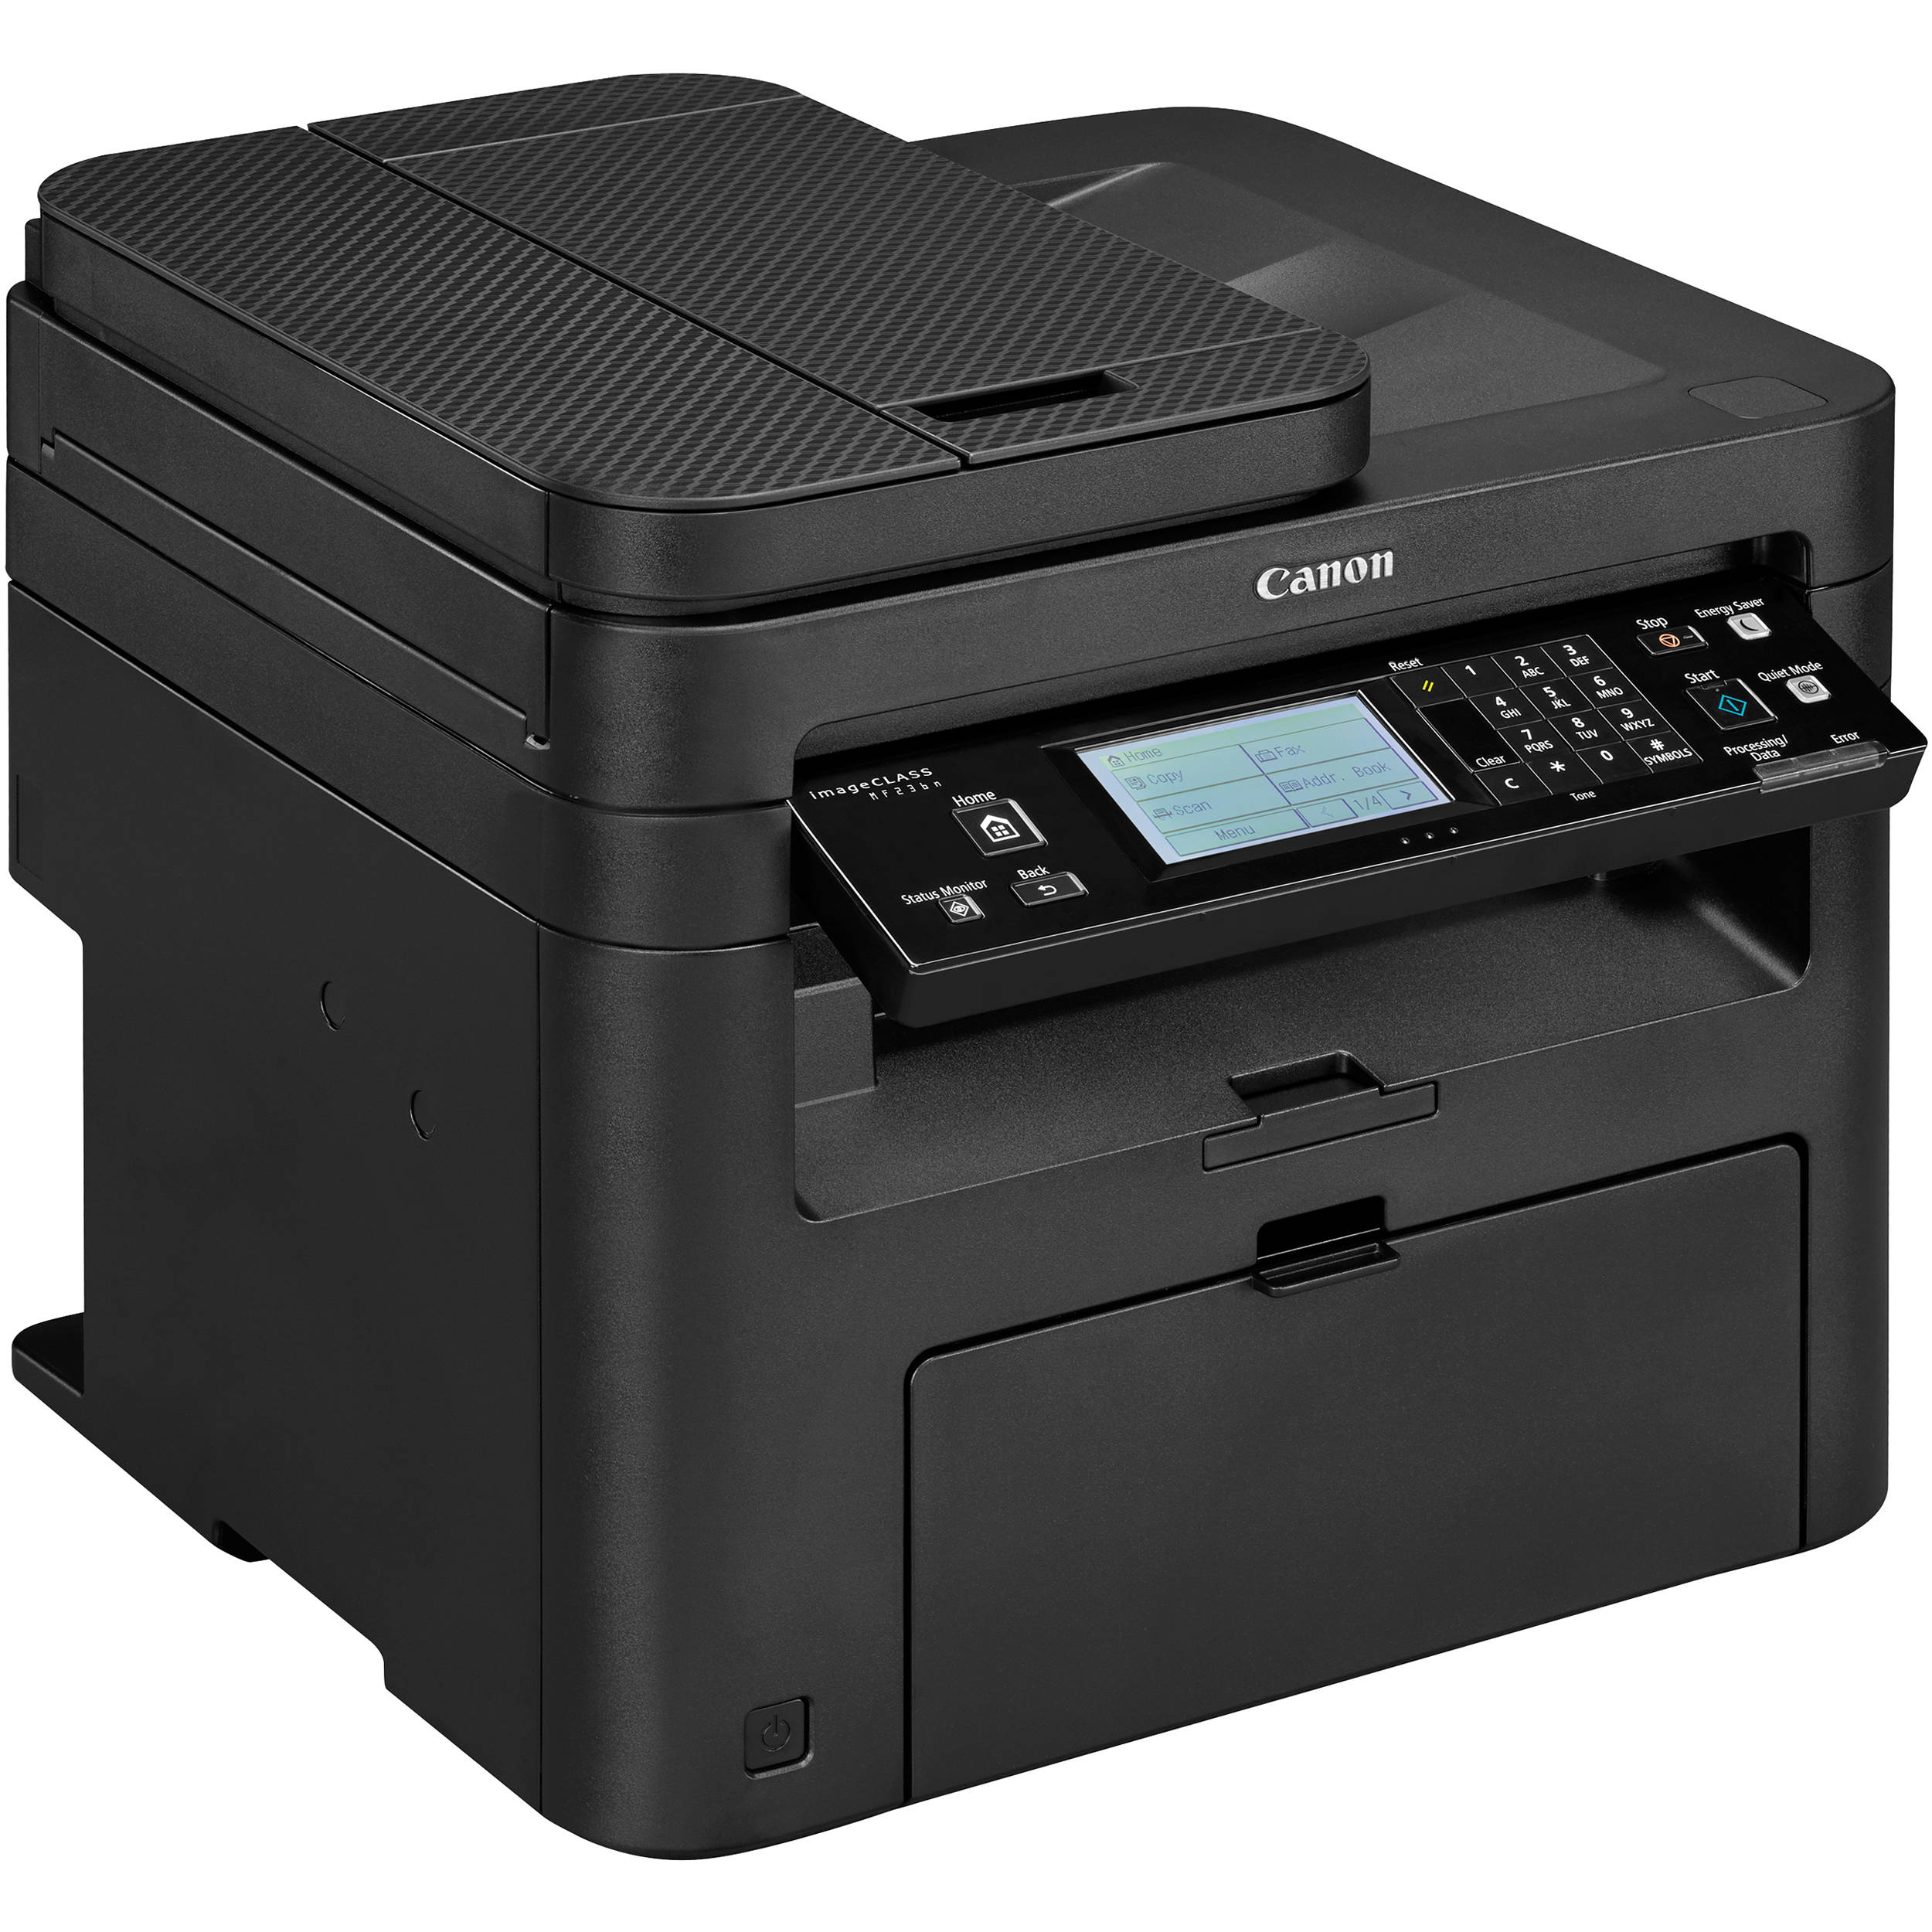 Canon imageCLASS MF236N All-in-One Monochrome Laser Printer #1418C036AA